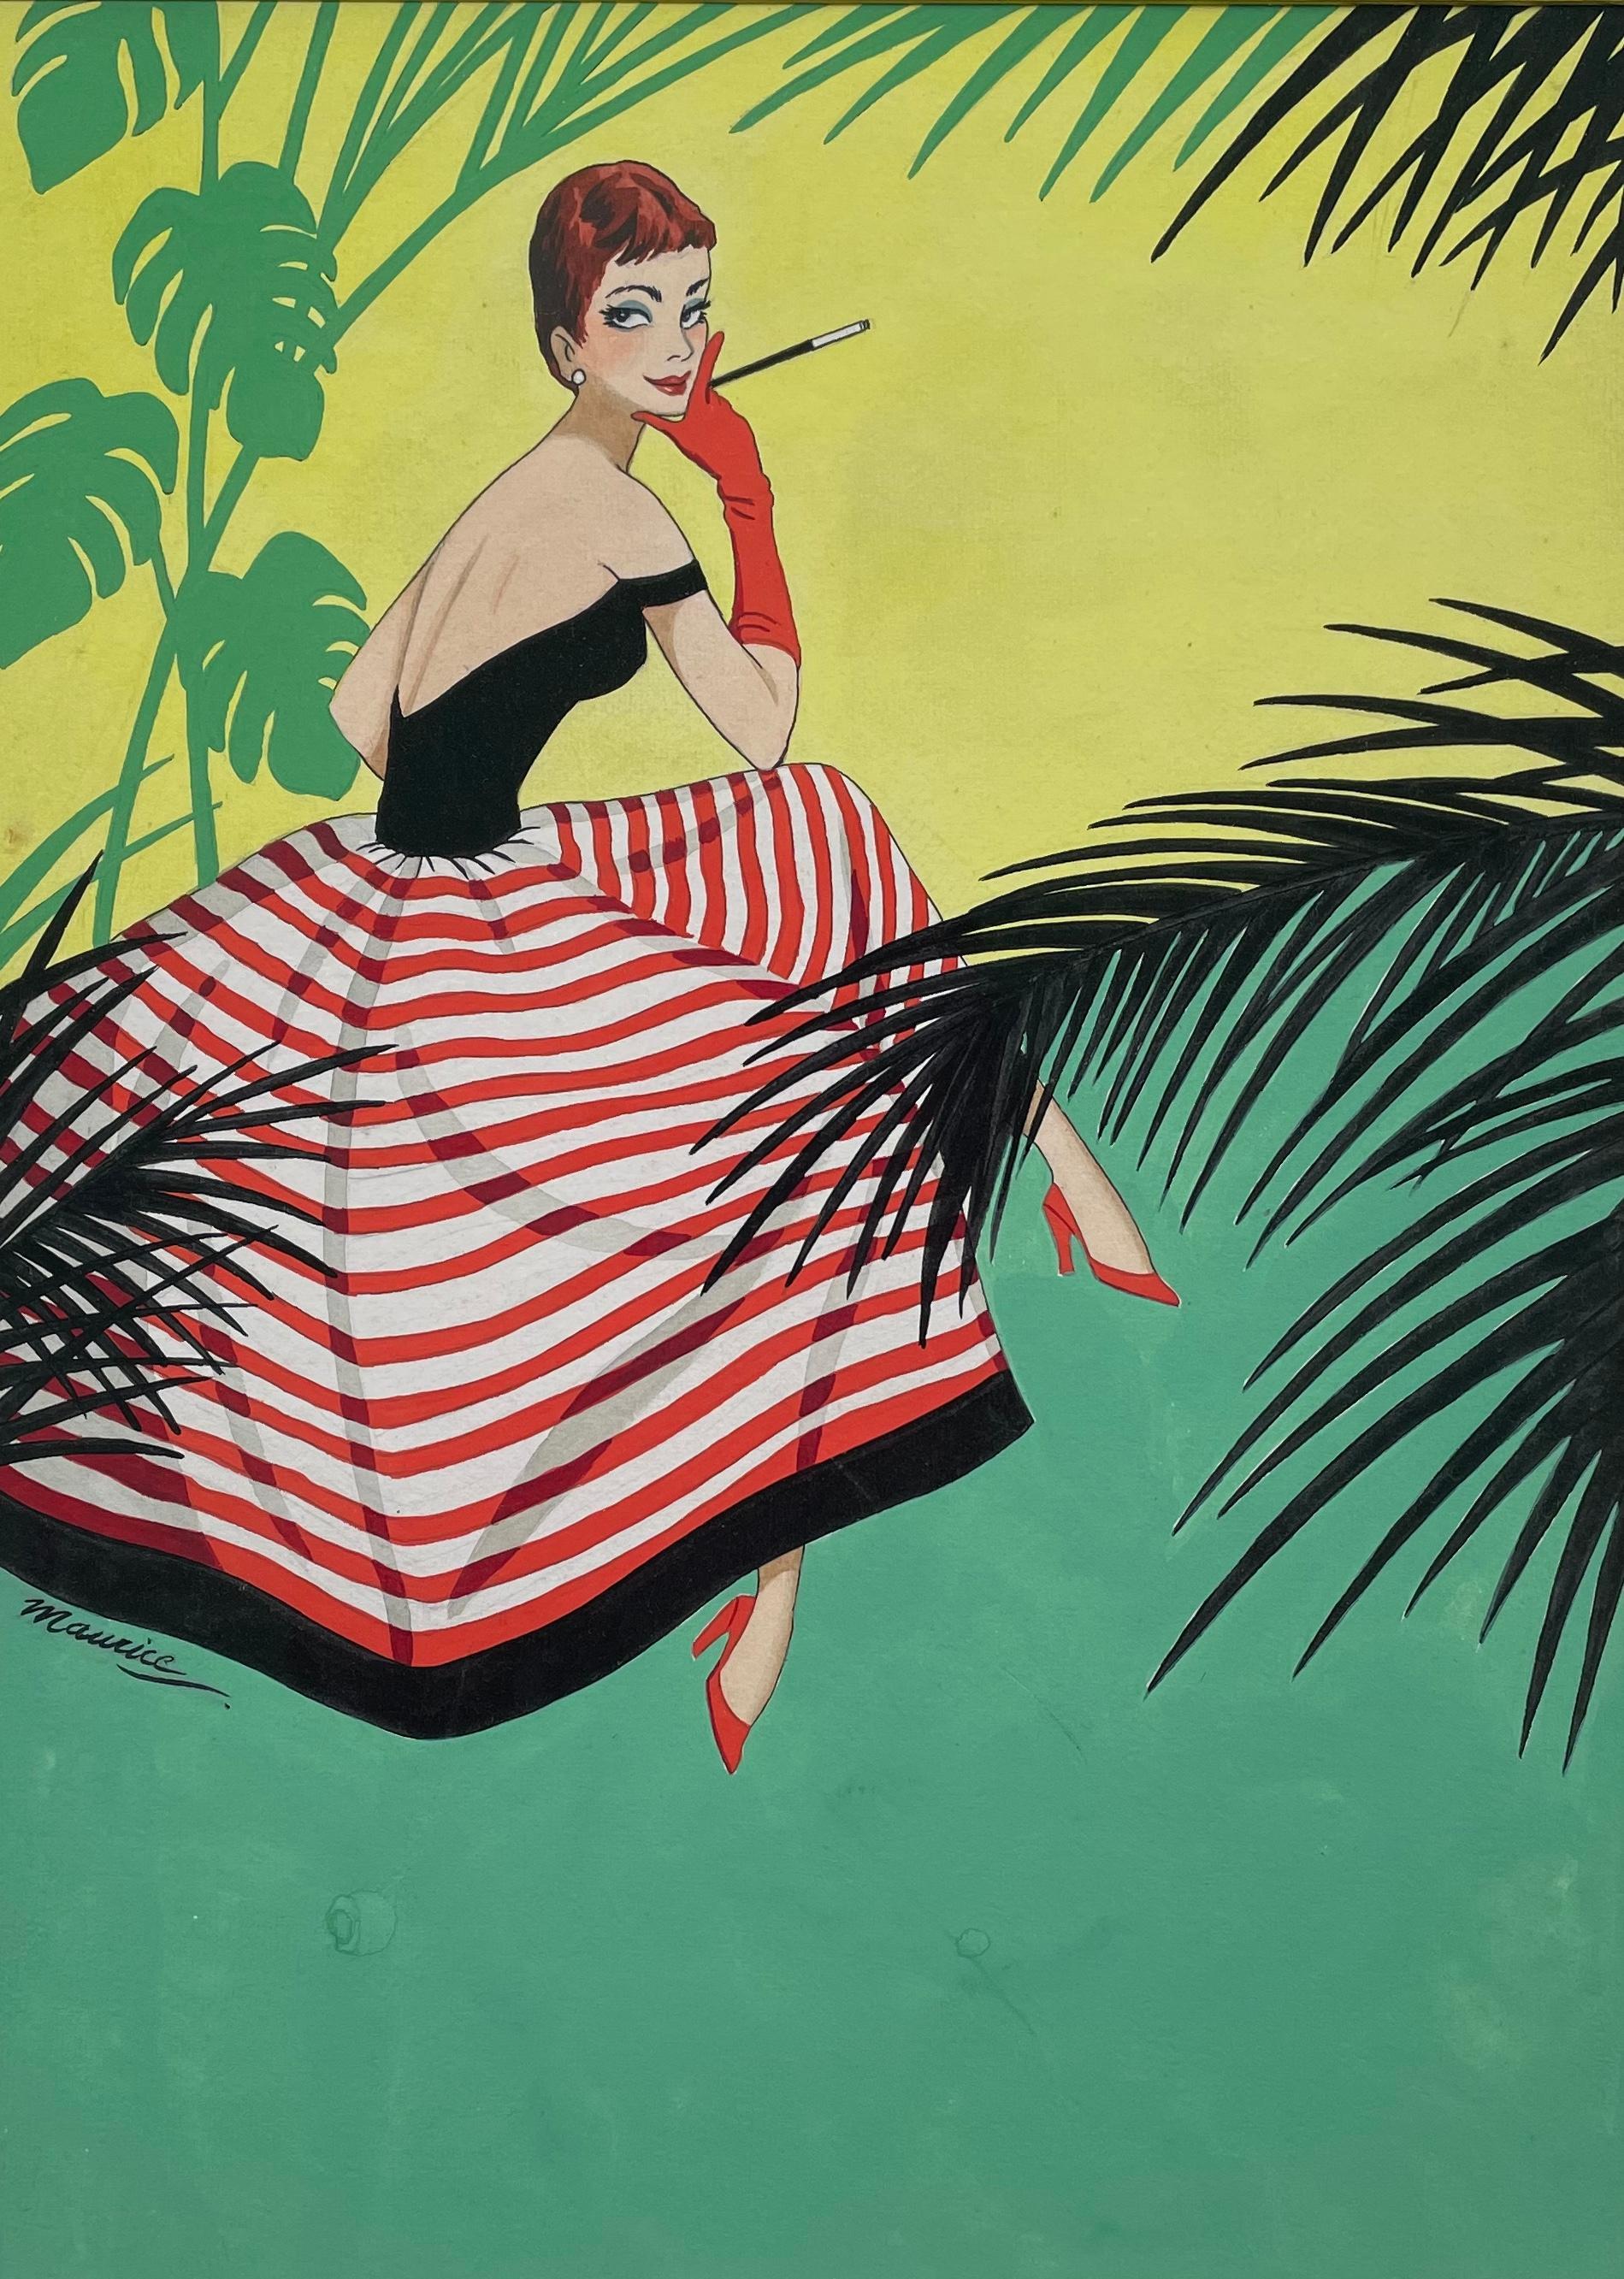 Girl in a Striped Skirt - 1950s British commercial art, gouache